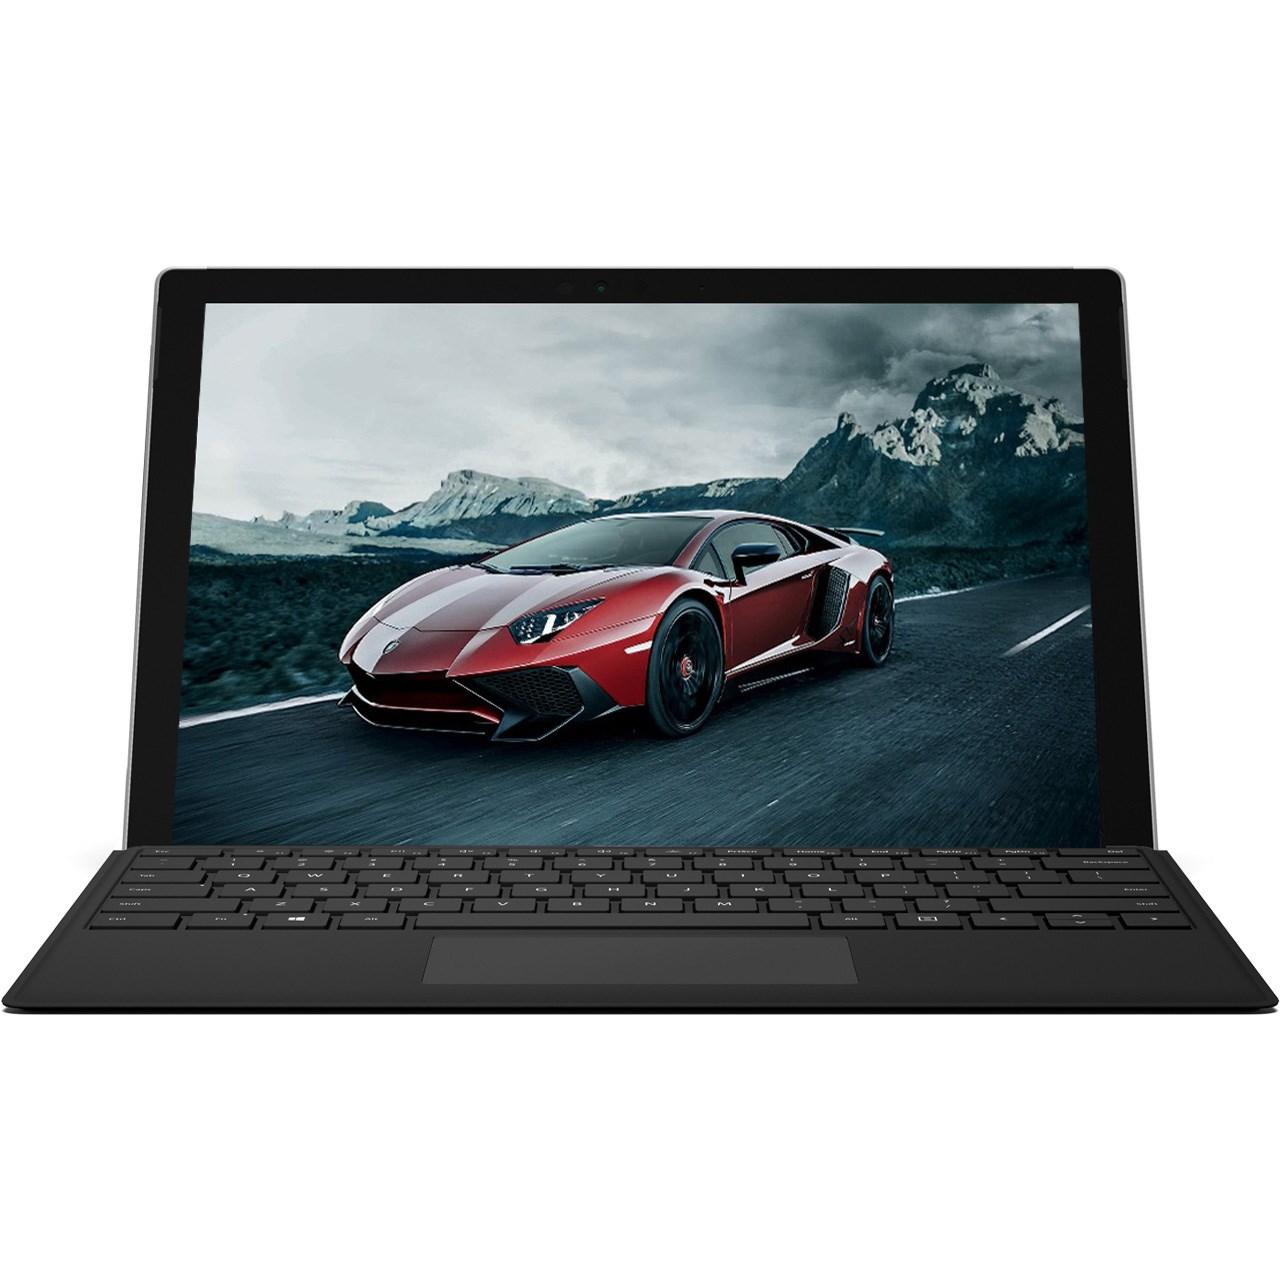 تبلت مایکروسافت مدل Surface Pro 2017 - E به همراه کیبورد Black Type Cover و کاور اس تی ام  مدل Dux